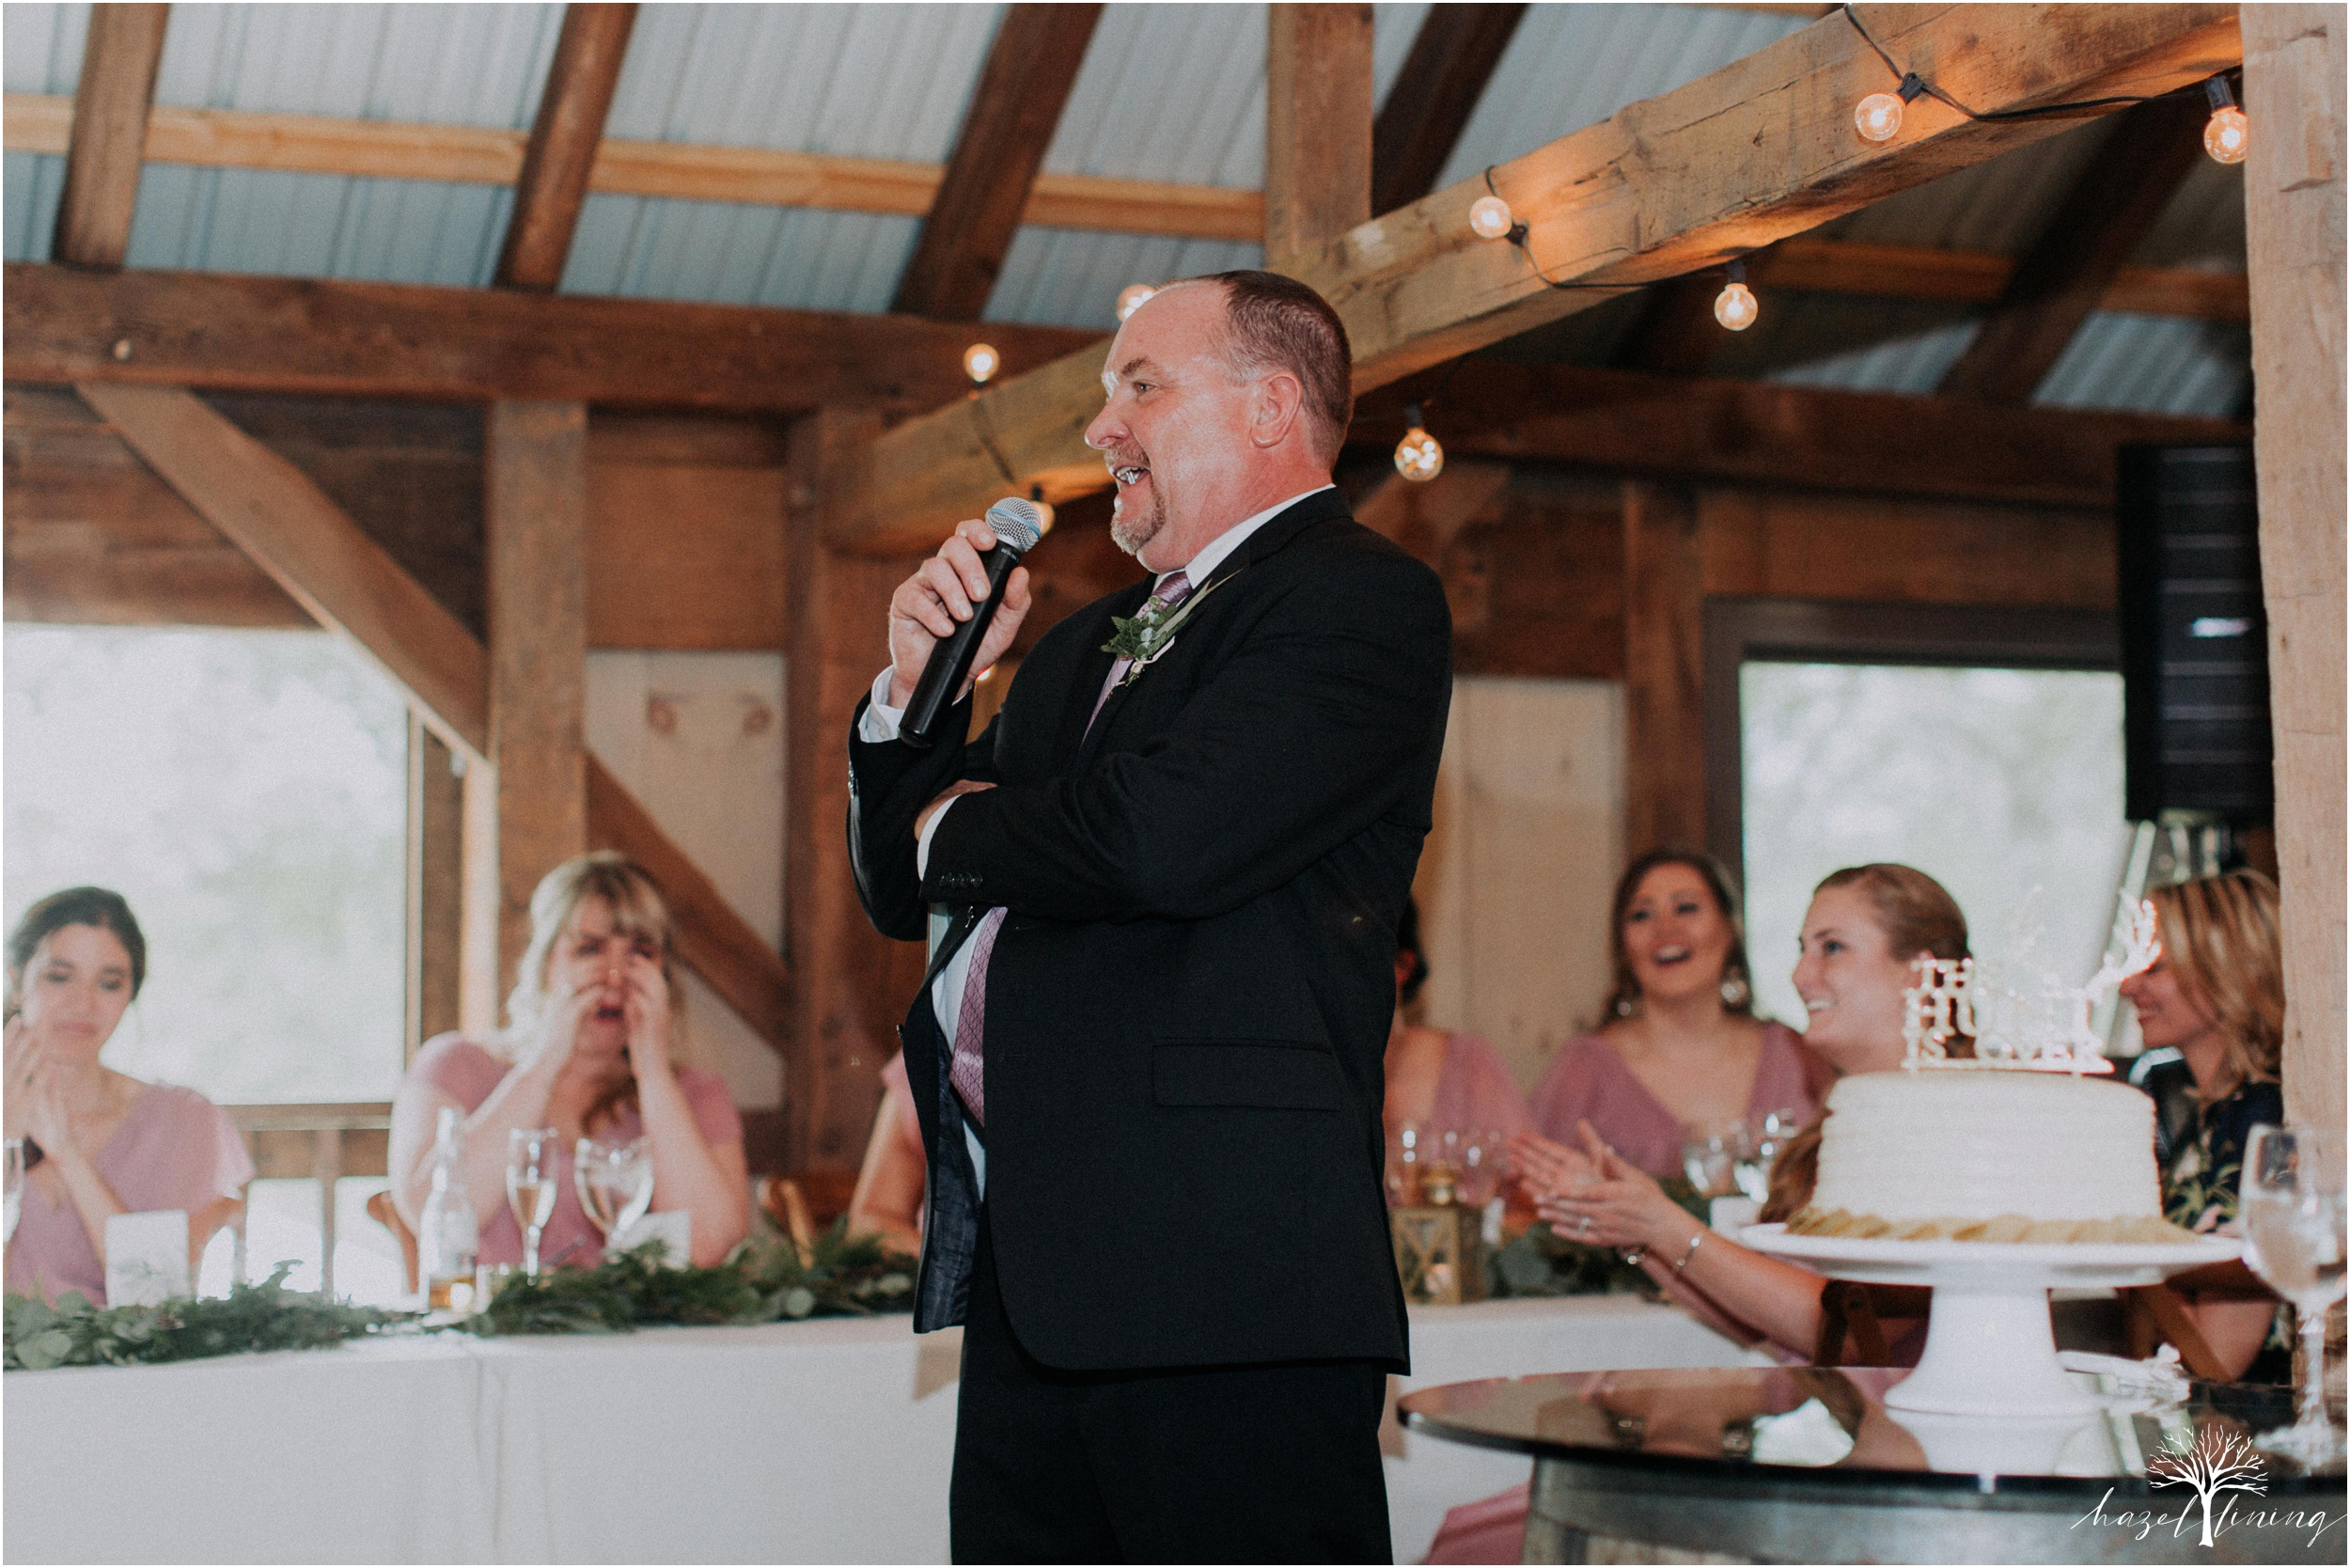 hazel-lining-travel-wedding-elopement-photography-lisa-landon-shoemaker-the-farm-bakery-and-events-bucks-county-quakertown-pennsylvania-summer-country-outdoor-farm-wedding_0118.jpg